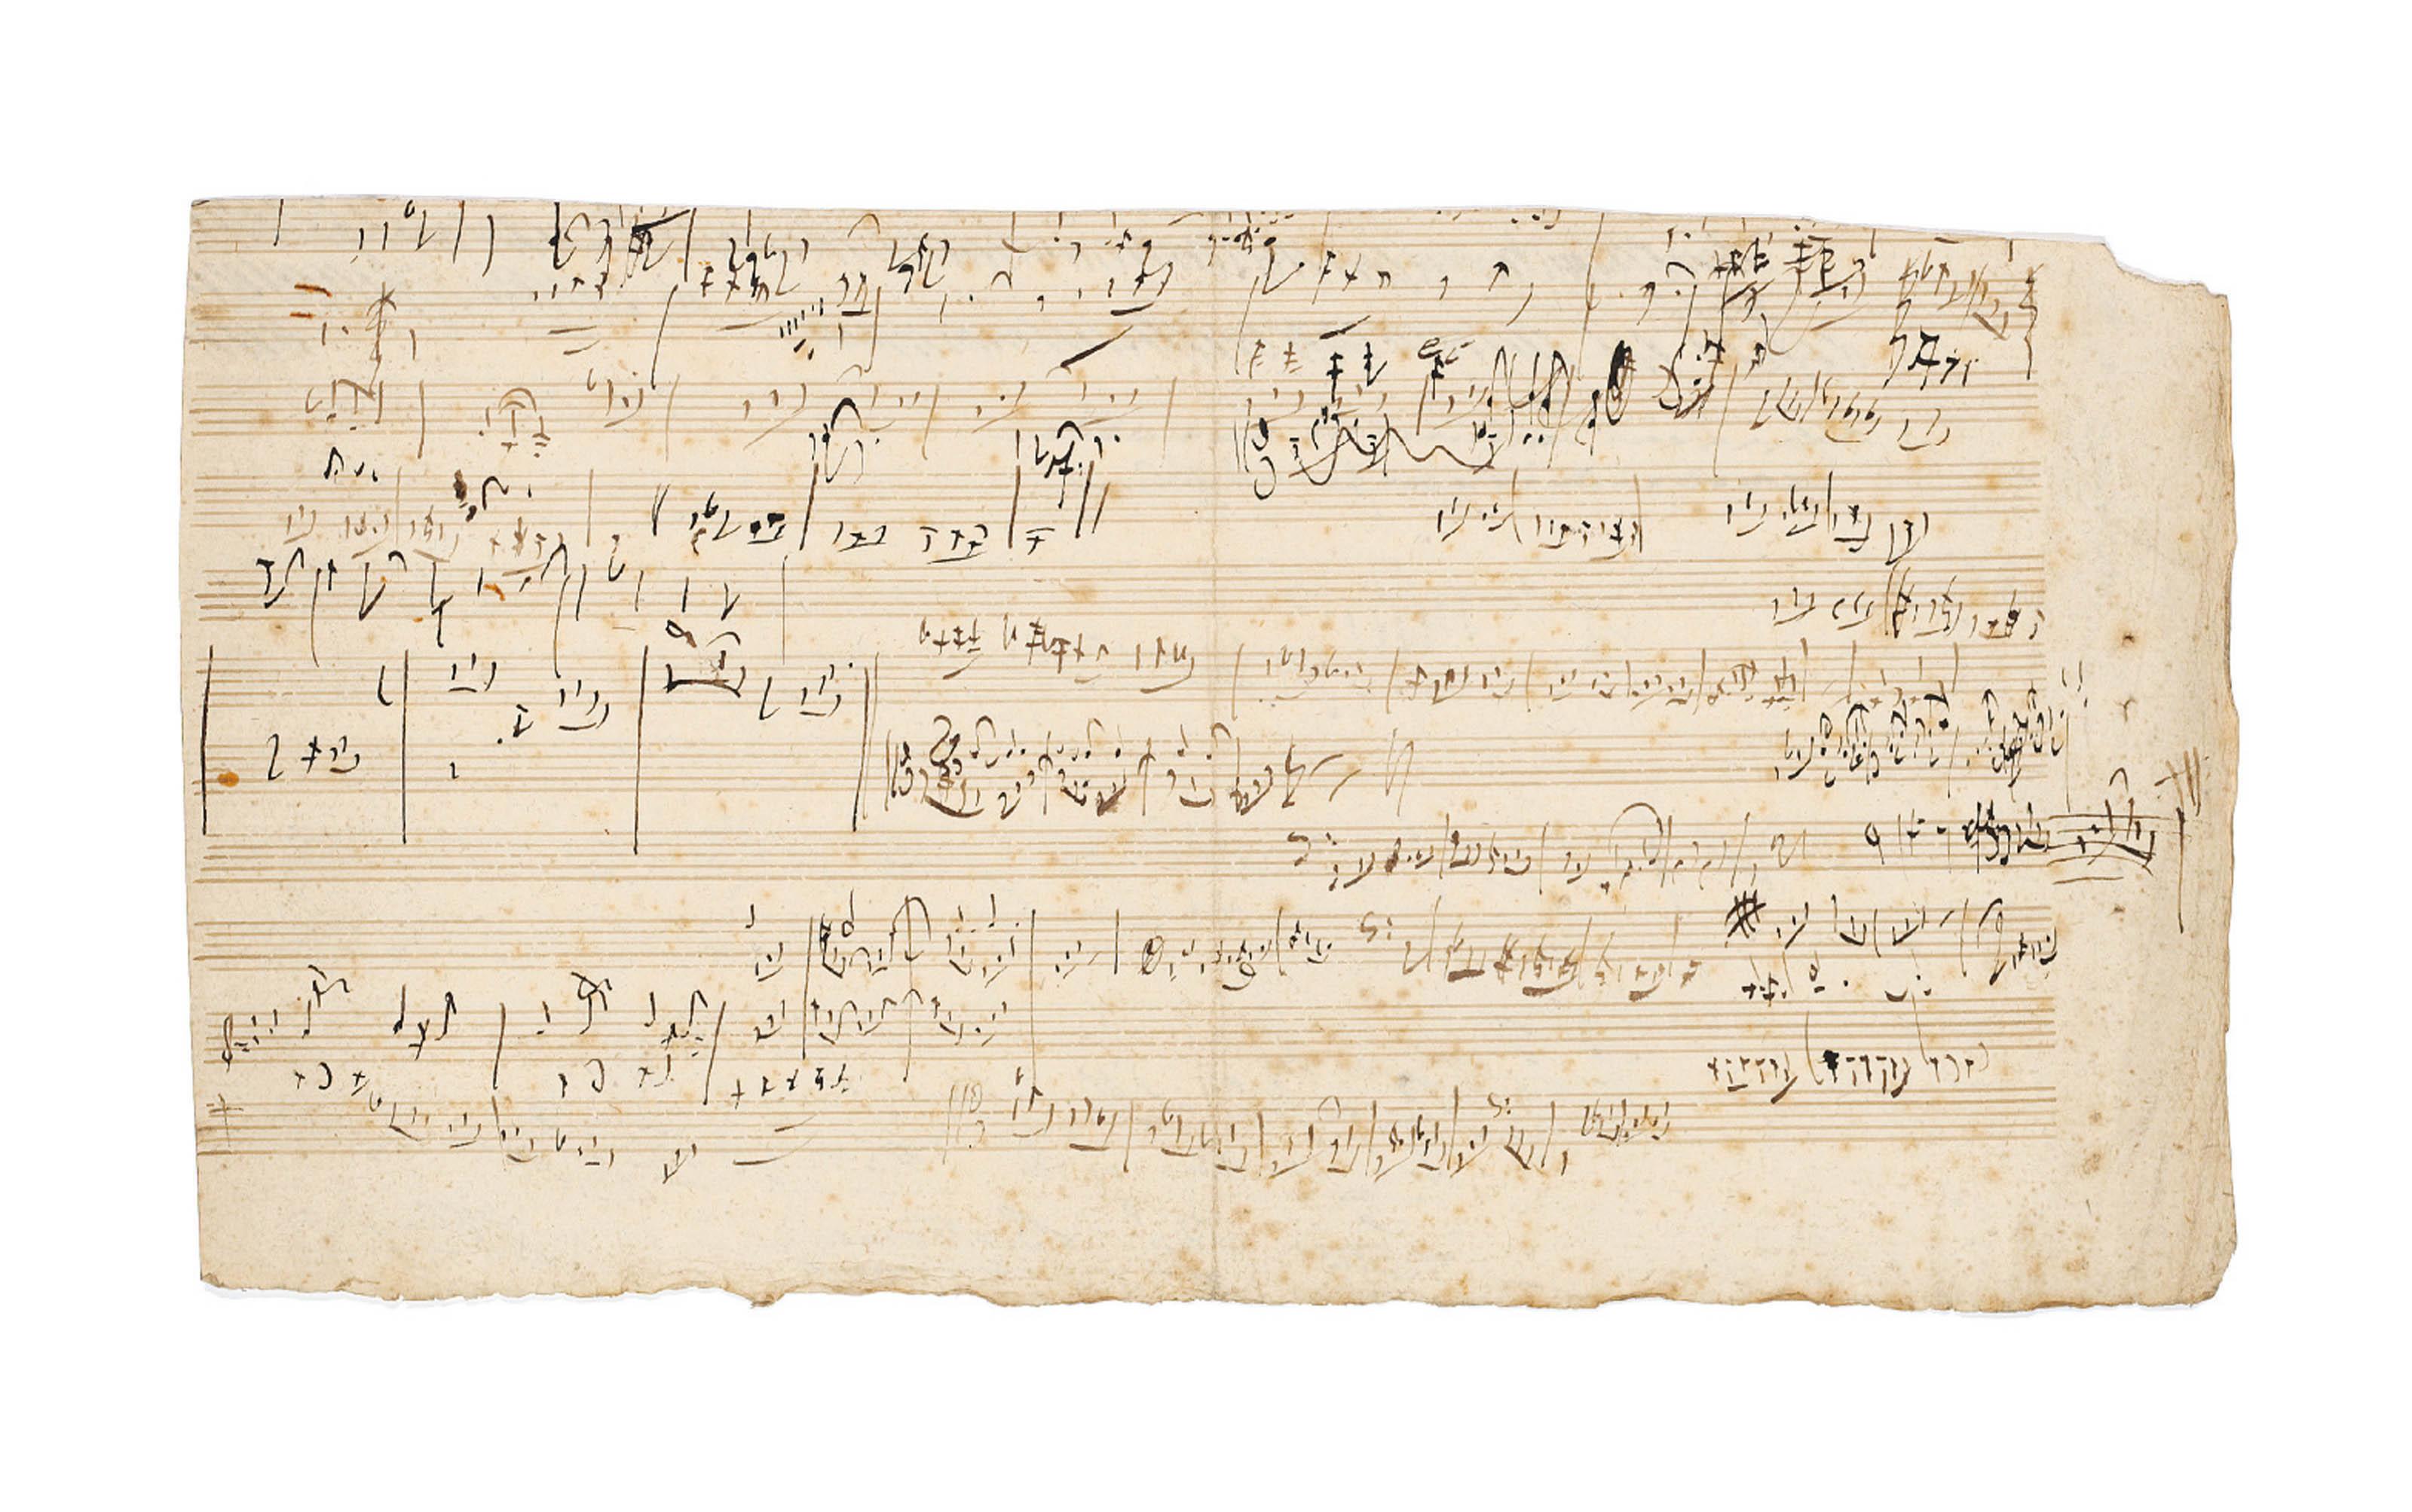 Audio: Autograph Music Manuscript by Ludwig van Beethoven